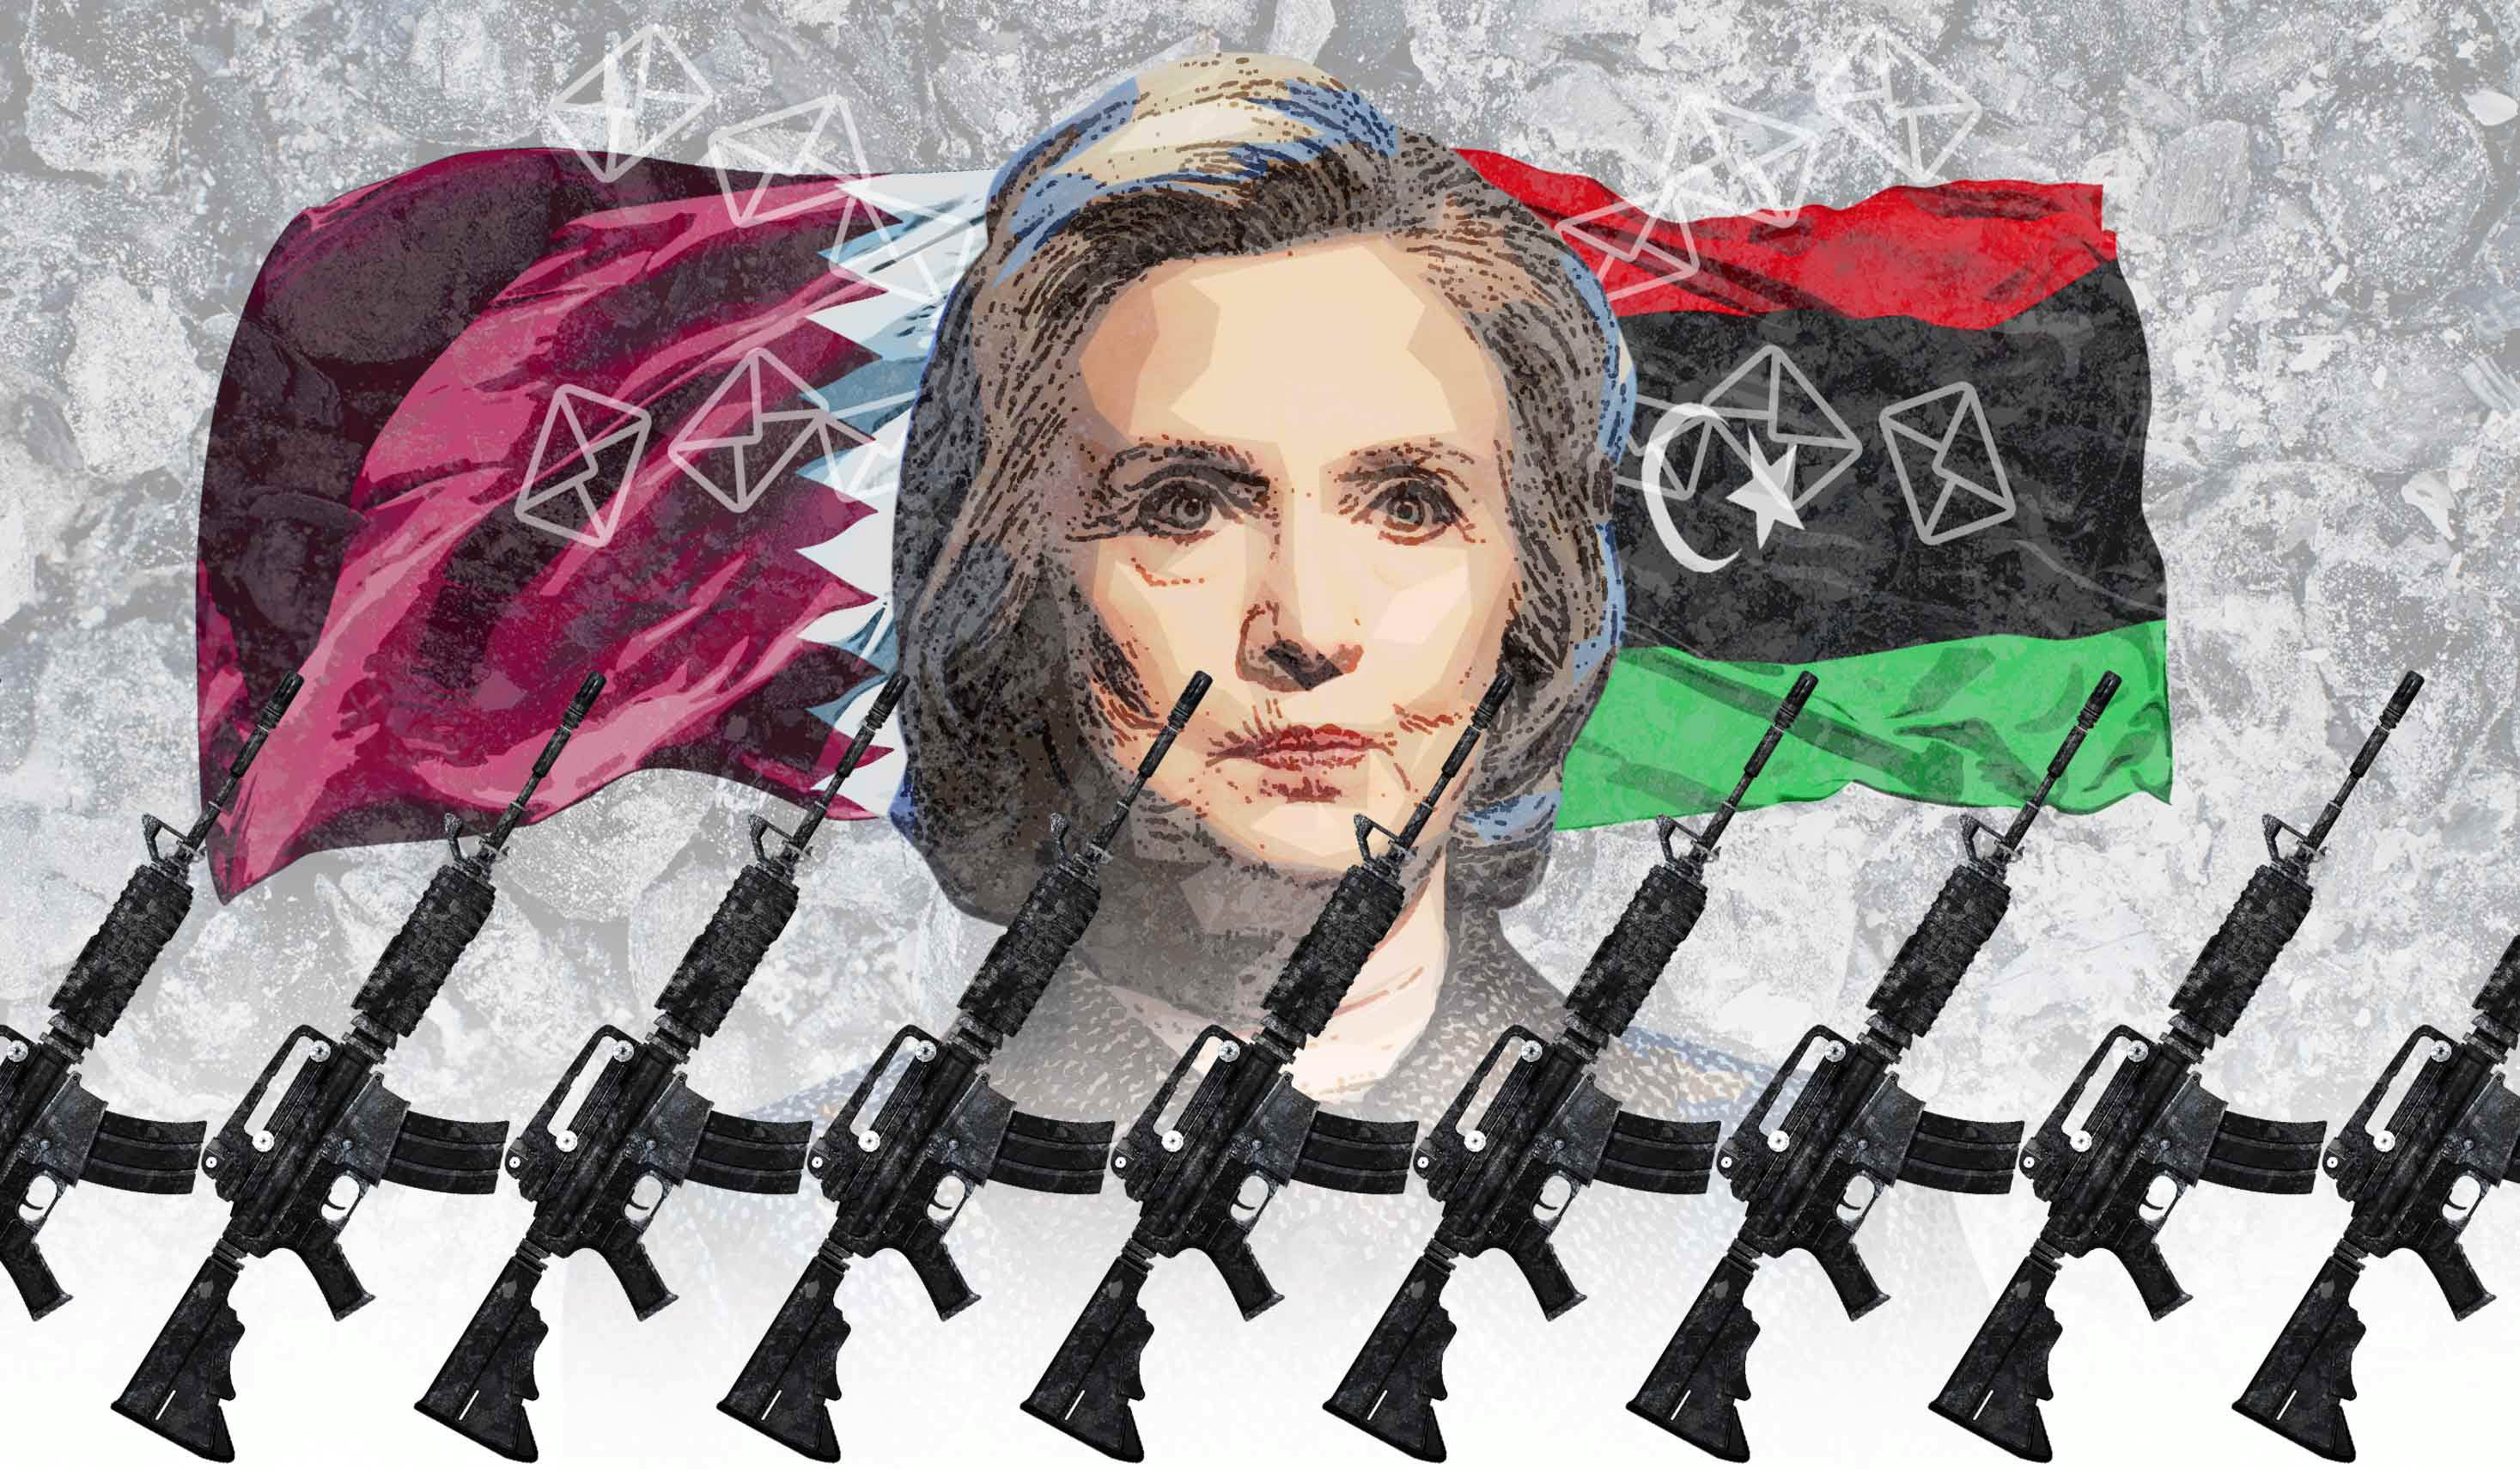 http://www.activistpost.com/wp-content/uploads/2015/11/7_1_2015_b3-napo-hillary-war8201.jpg